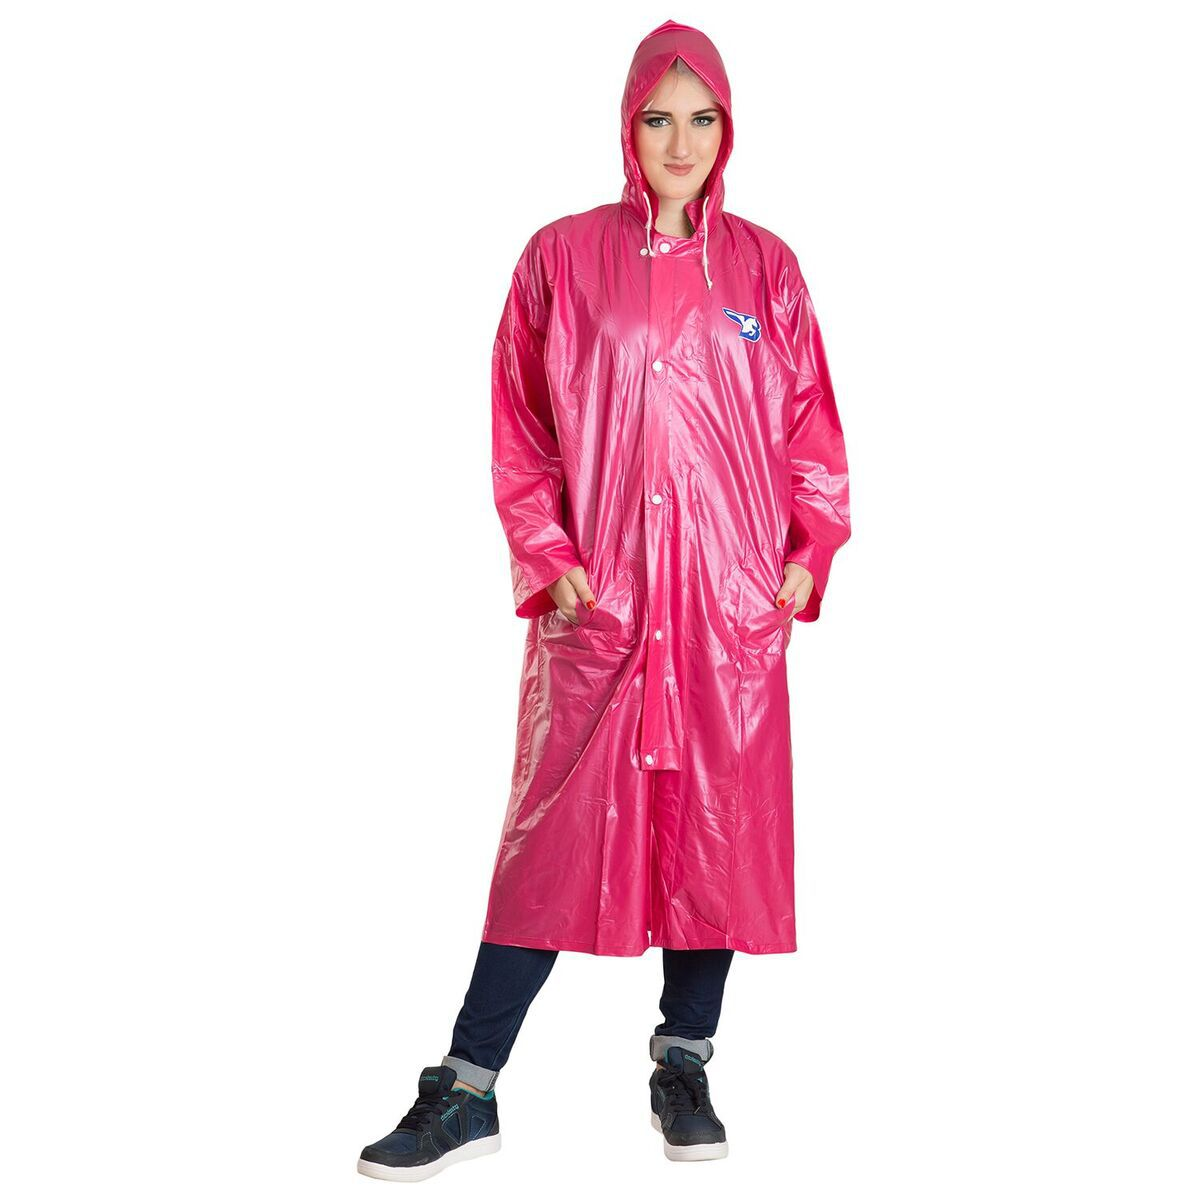 Burdy Polyester Long Raincoat - Pink